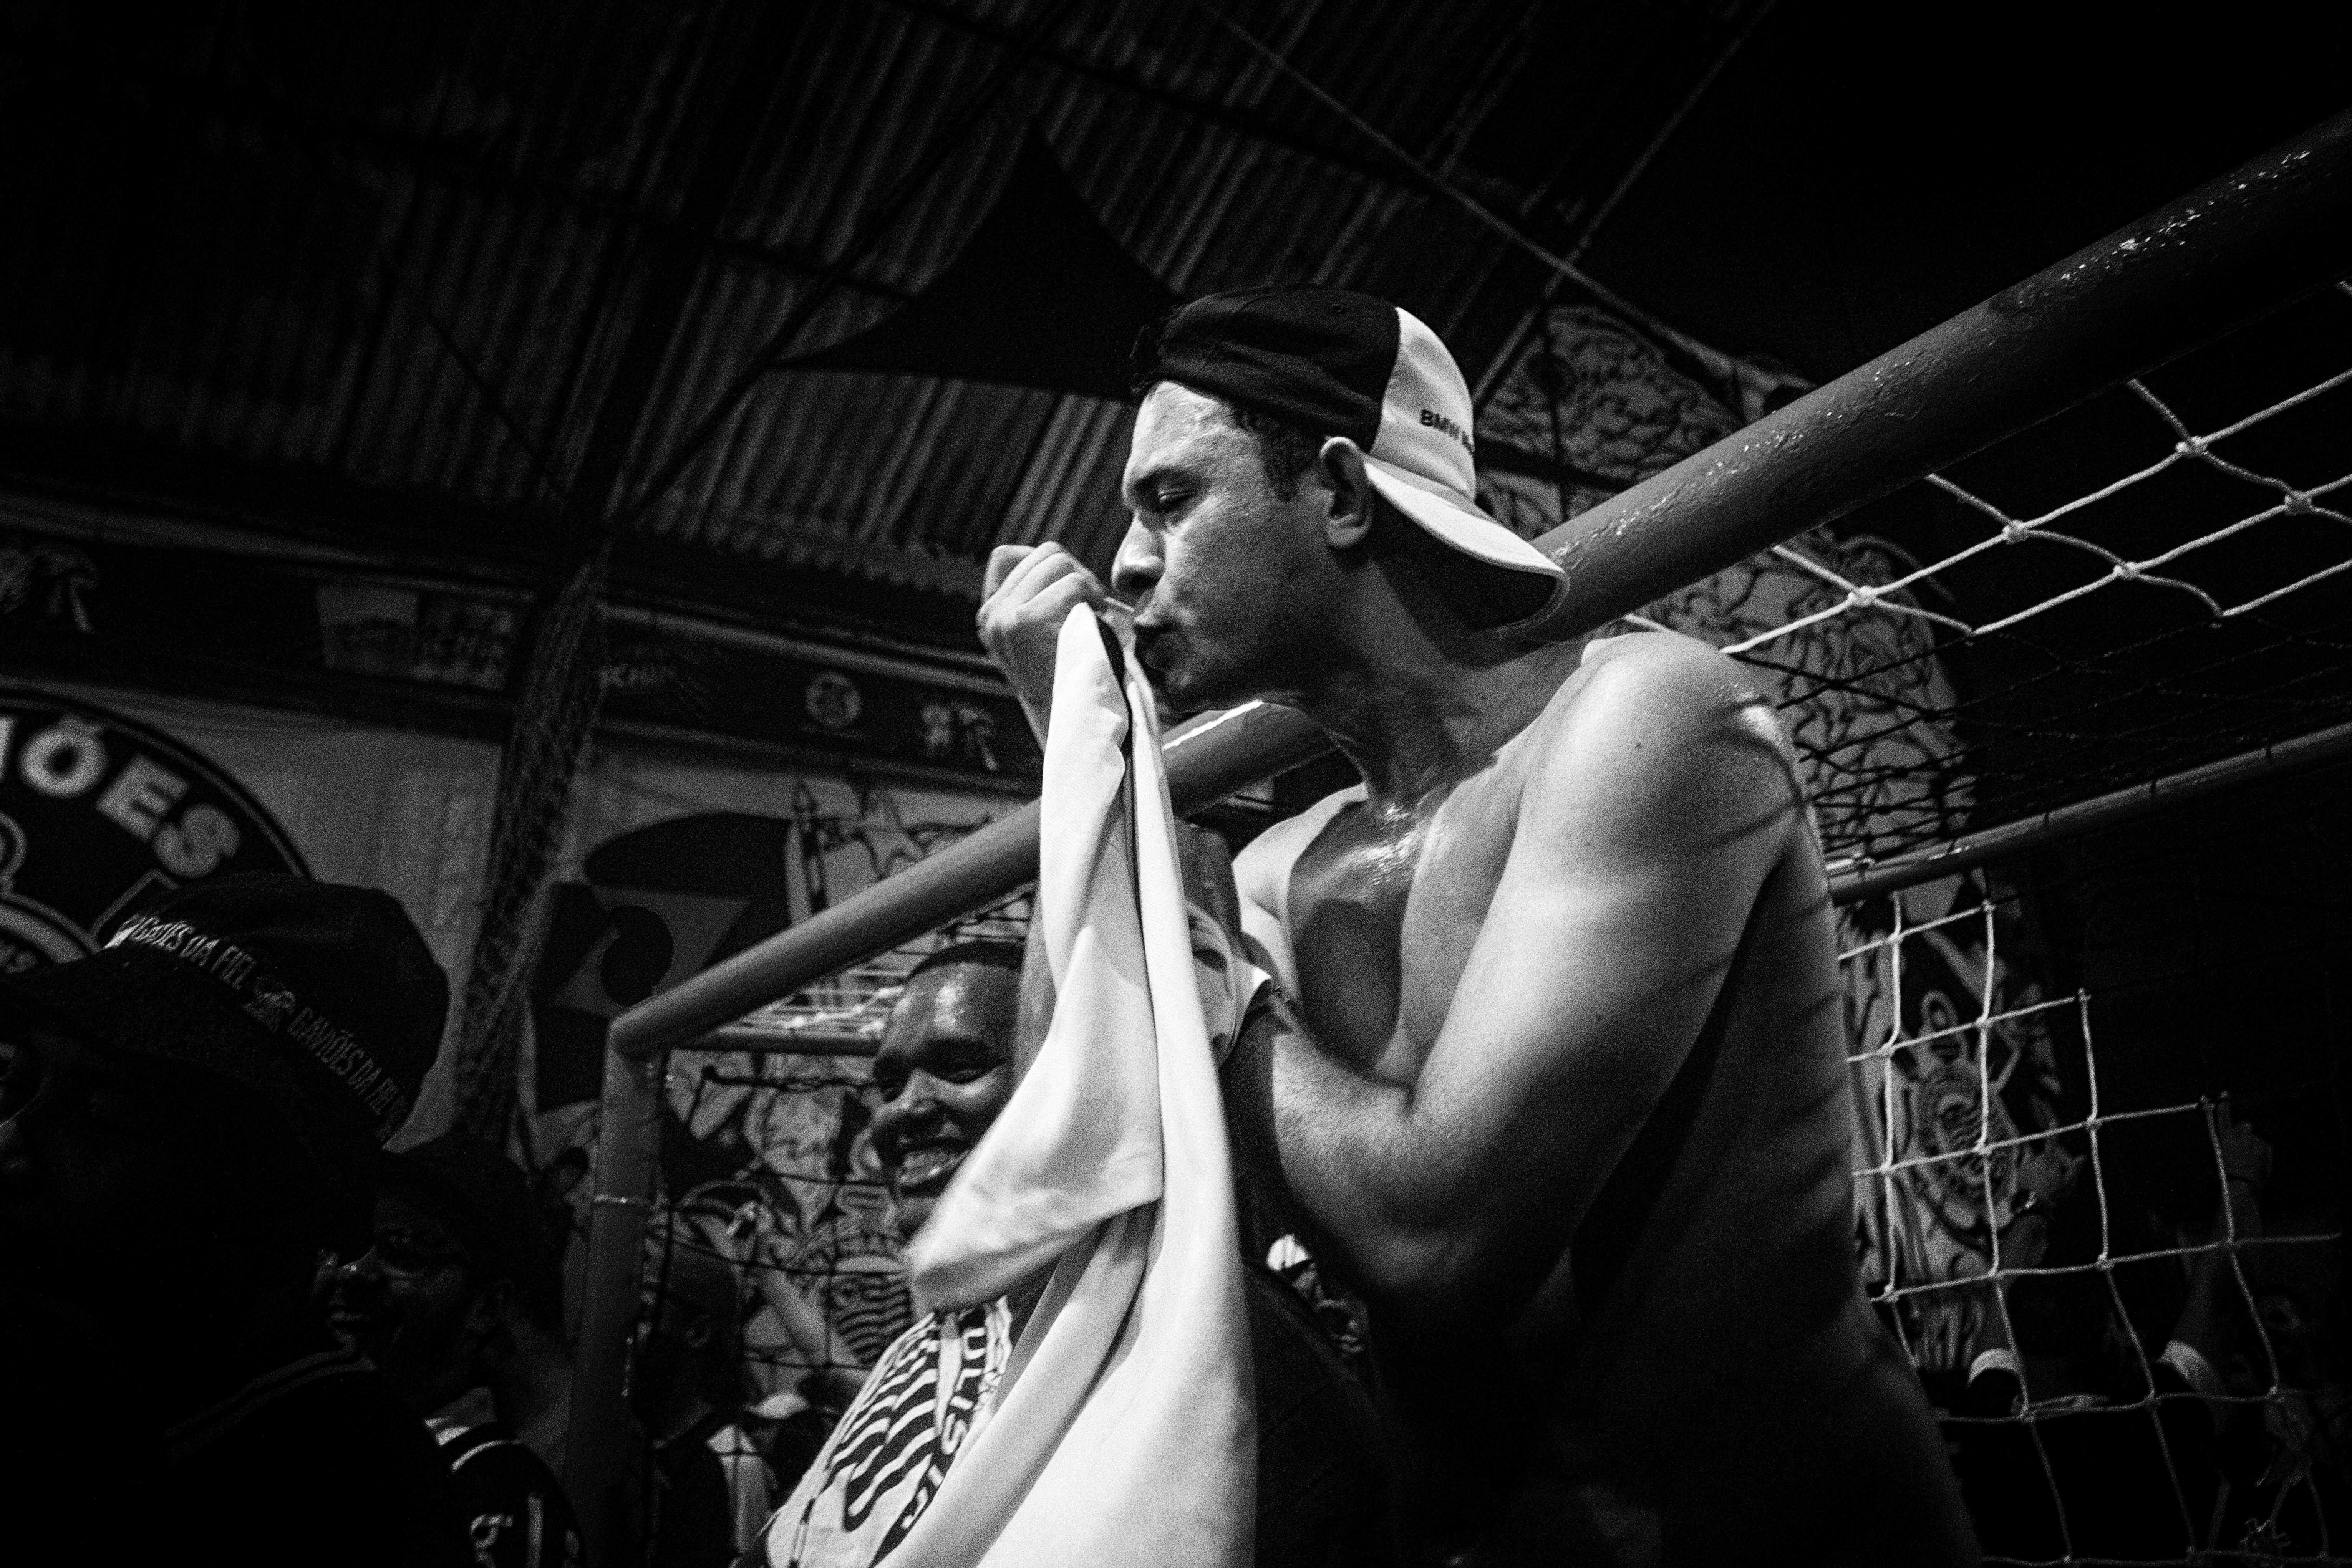 Foto: Tuane Fernandes